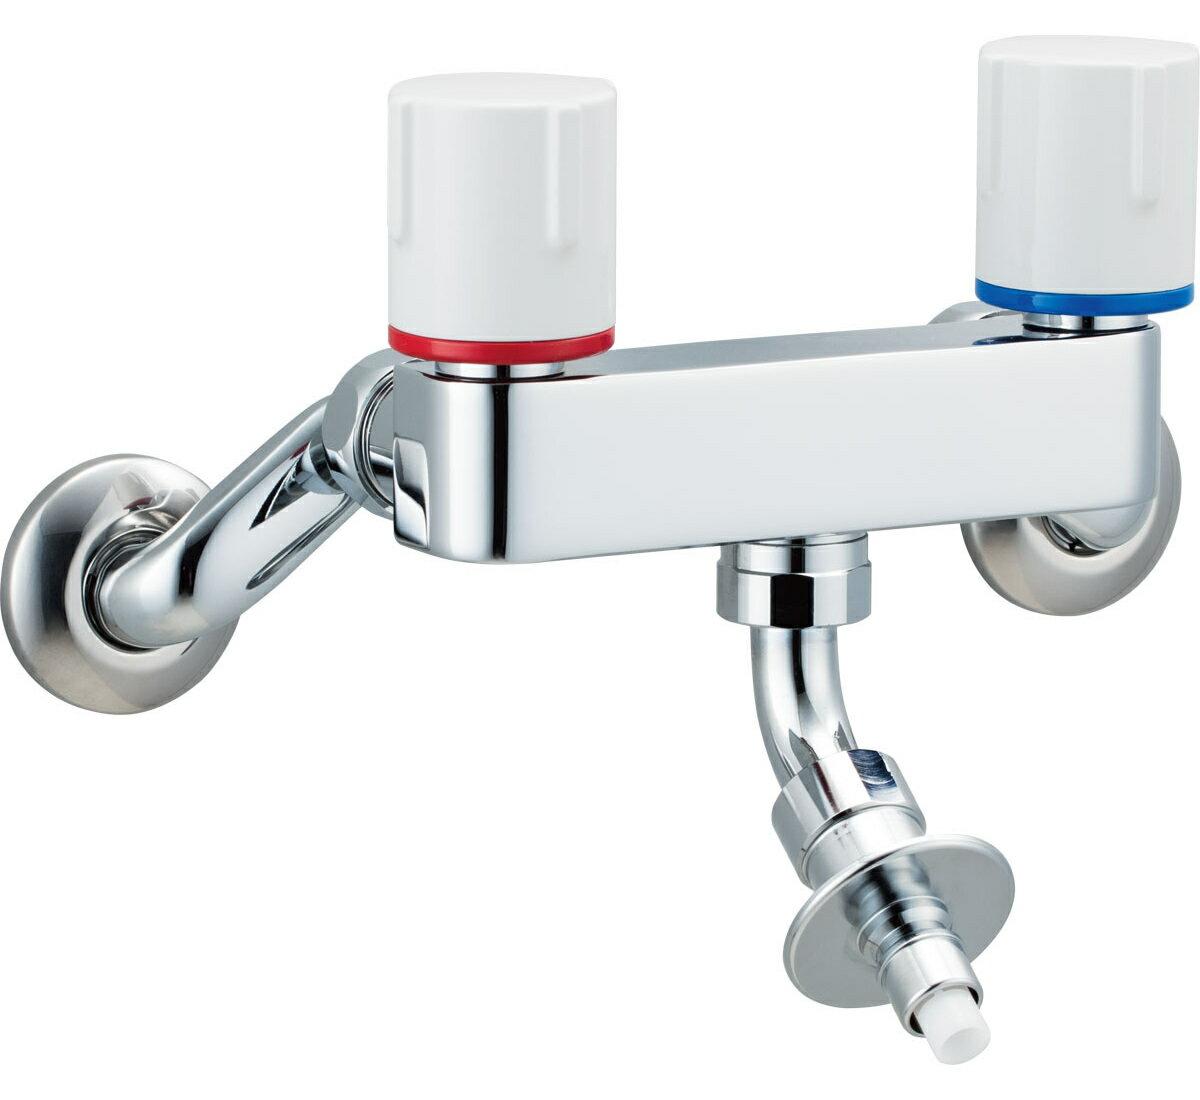 INAX 定番スタイル イナックス LIXIL リクシル 人気急上昇 SF-WL63RQN 緊急止水弁付2ハンドル混合水栓 洗濯機用水栓金具 屋内専用 寒冷地対応商品 露出タイプ